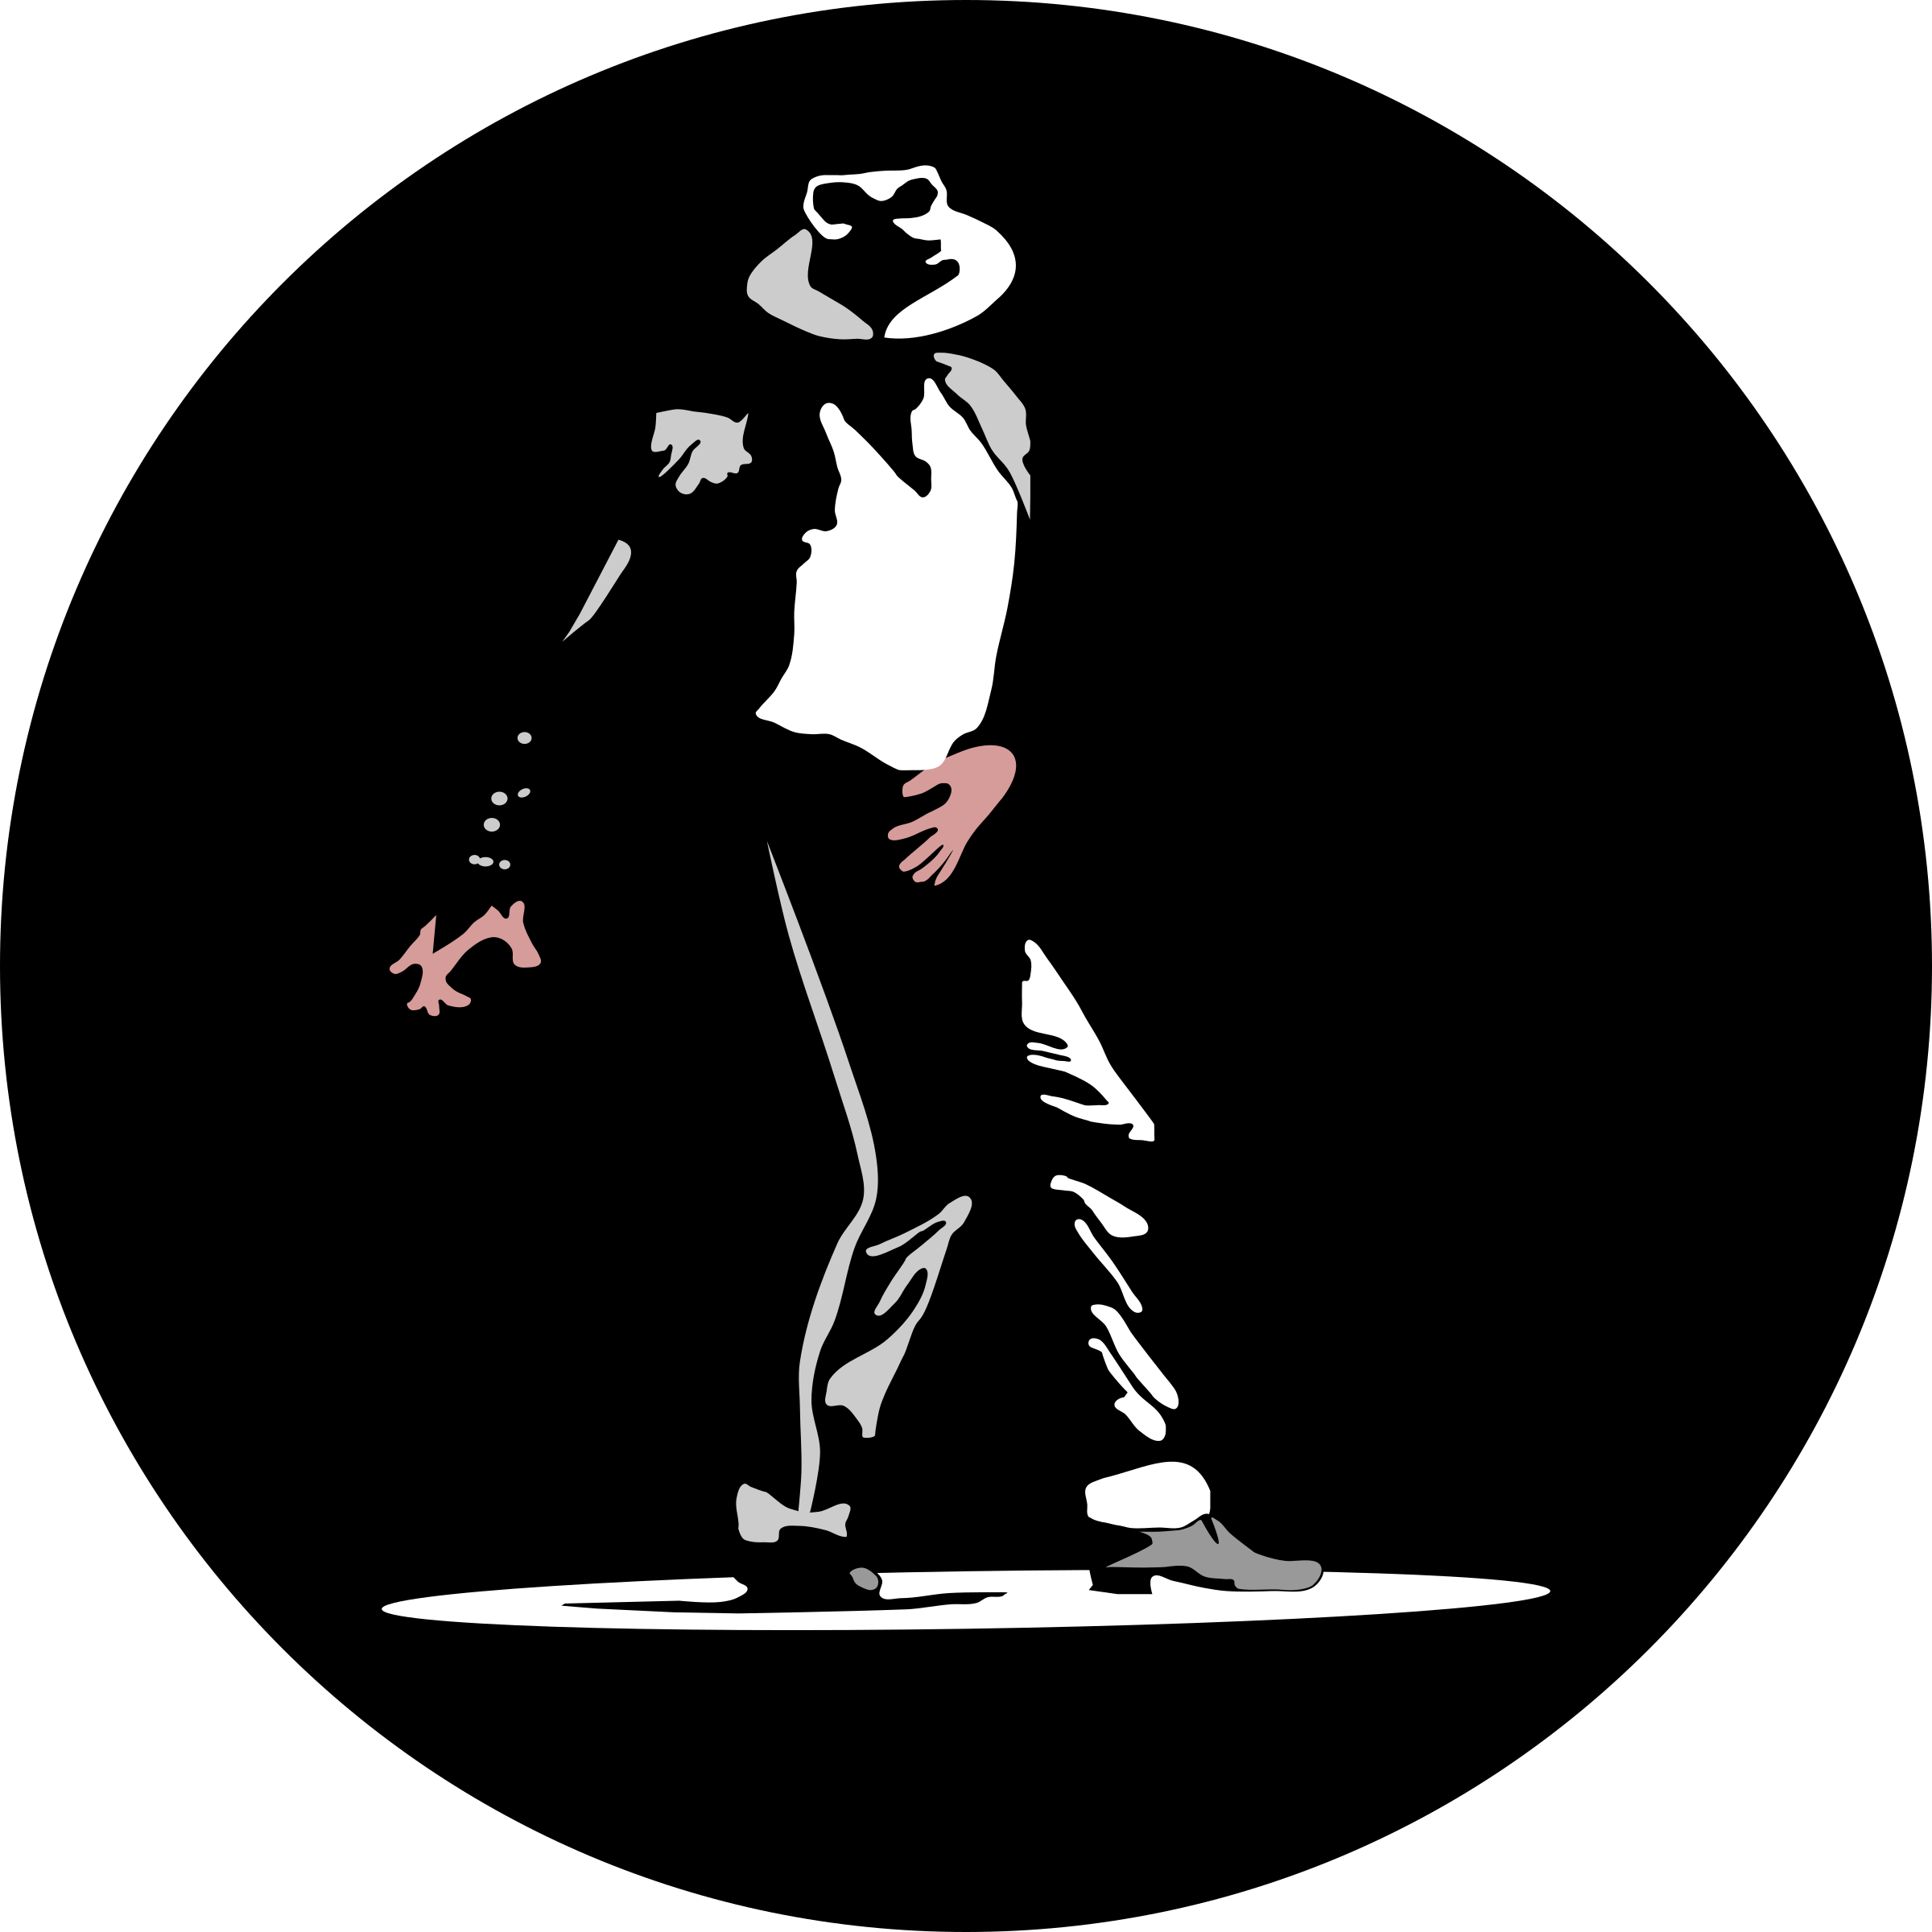 Free Michael Jackson Logo Png, Download Free Clip Art, Free.